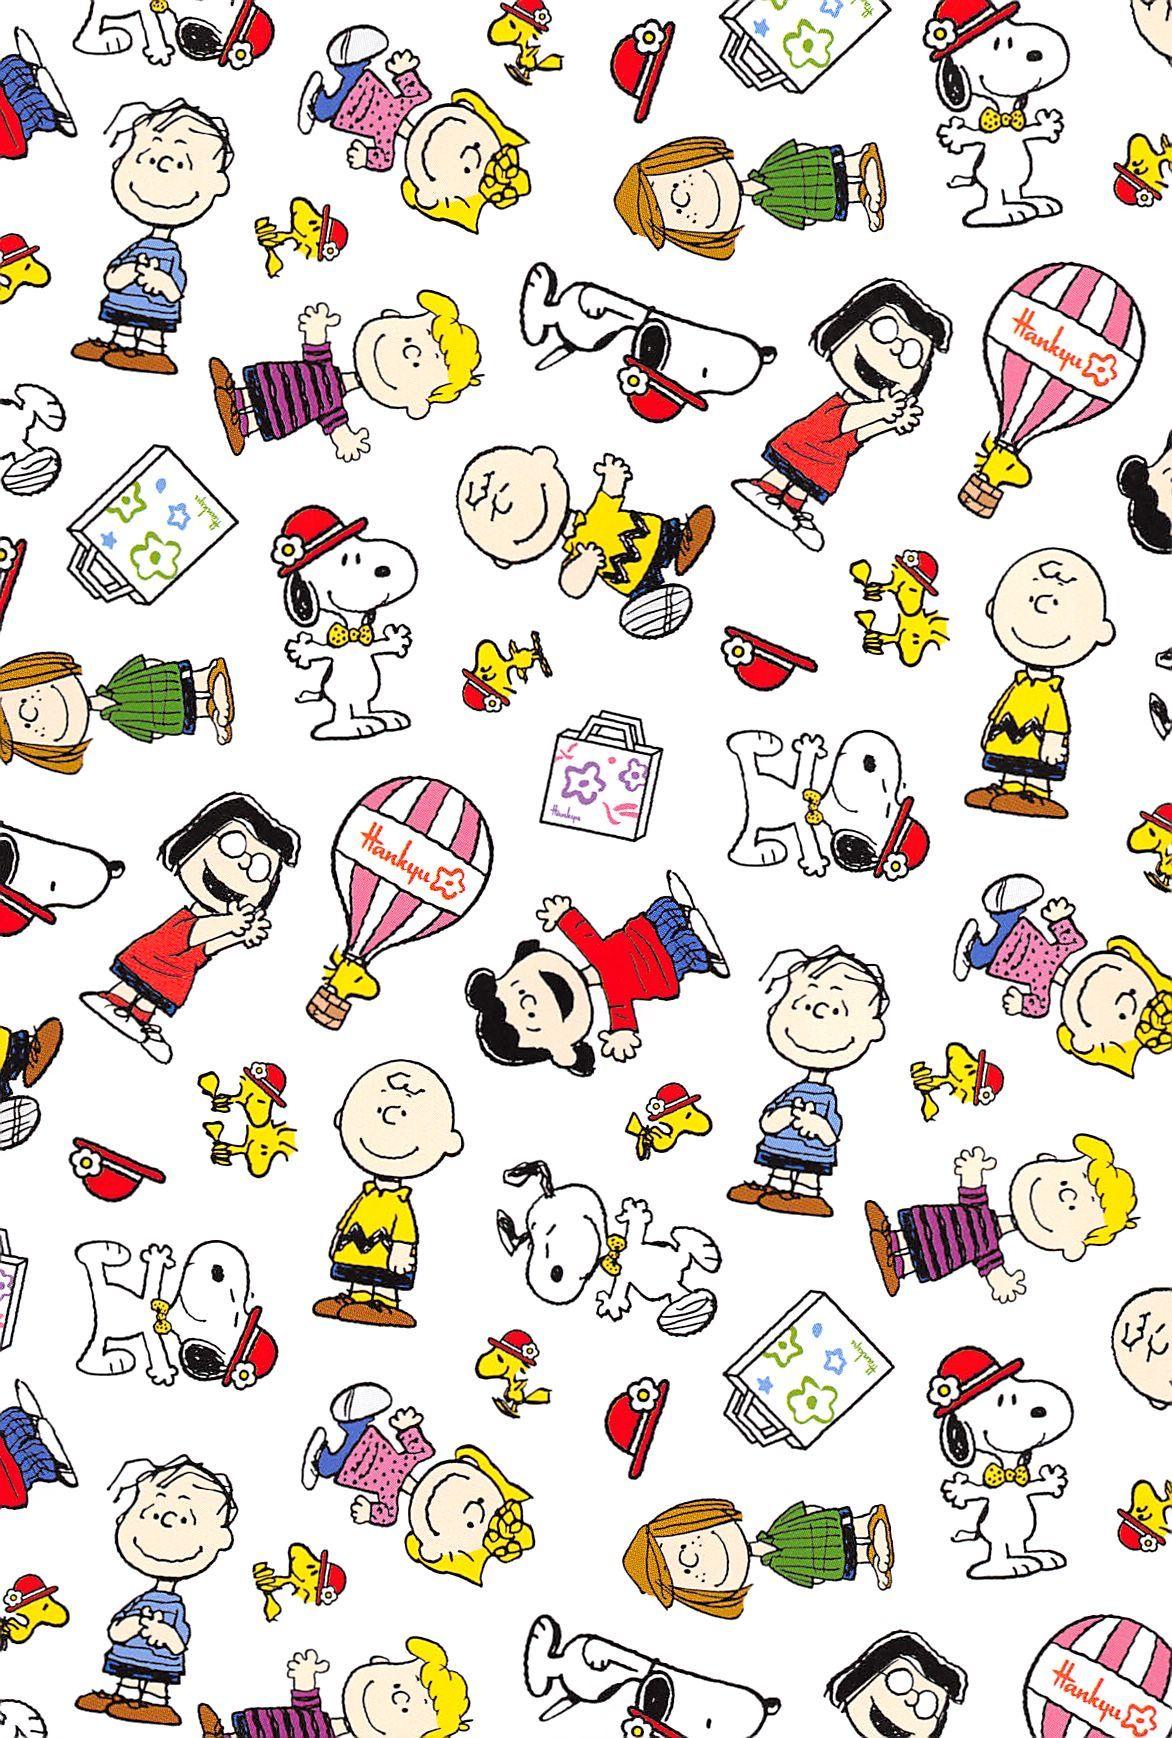 「Snoopy」おしゃれまとめの人気アイデア|Pinterest|LeeMien Khoo【2020